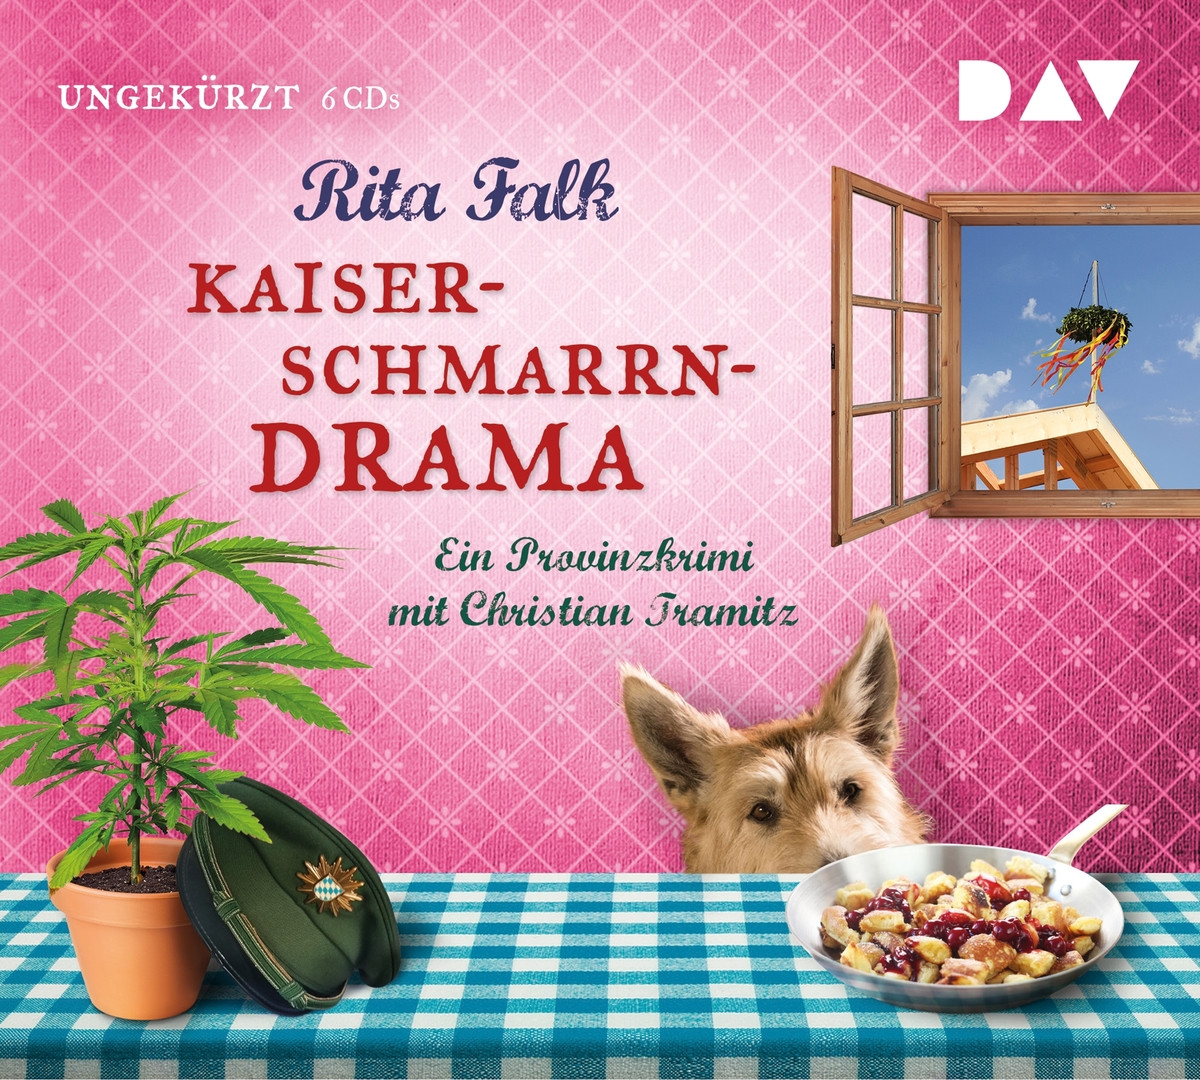 Rita Falk - Kaiserschmarrndrama. Ein Provinzkrimi